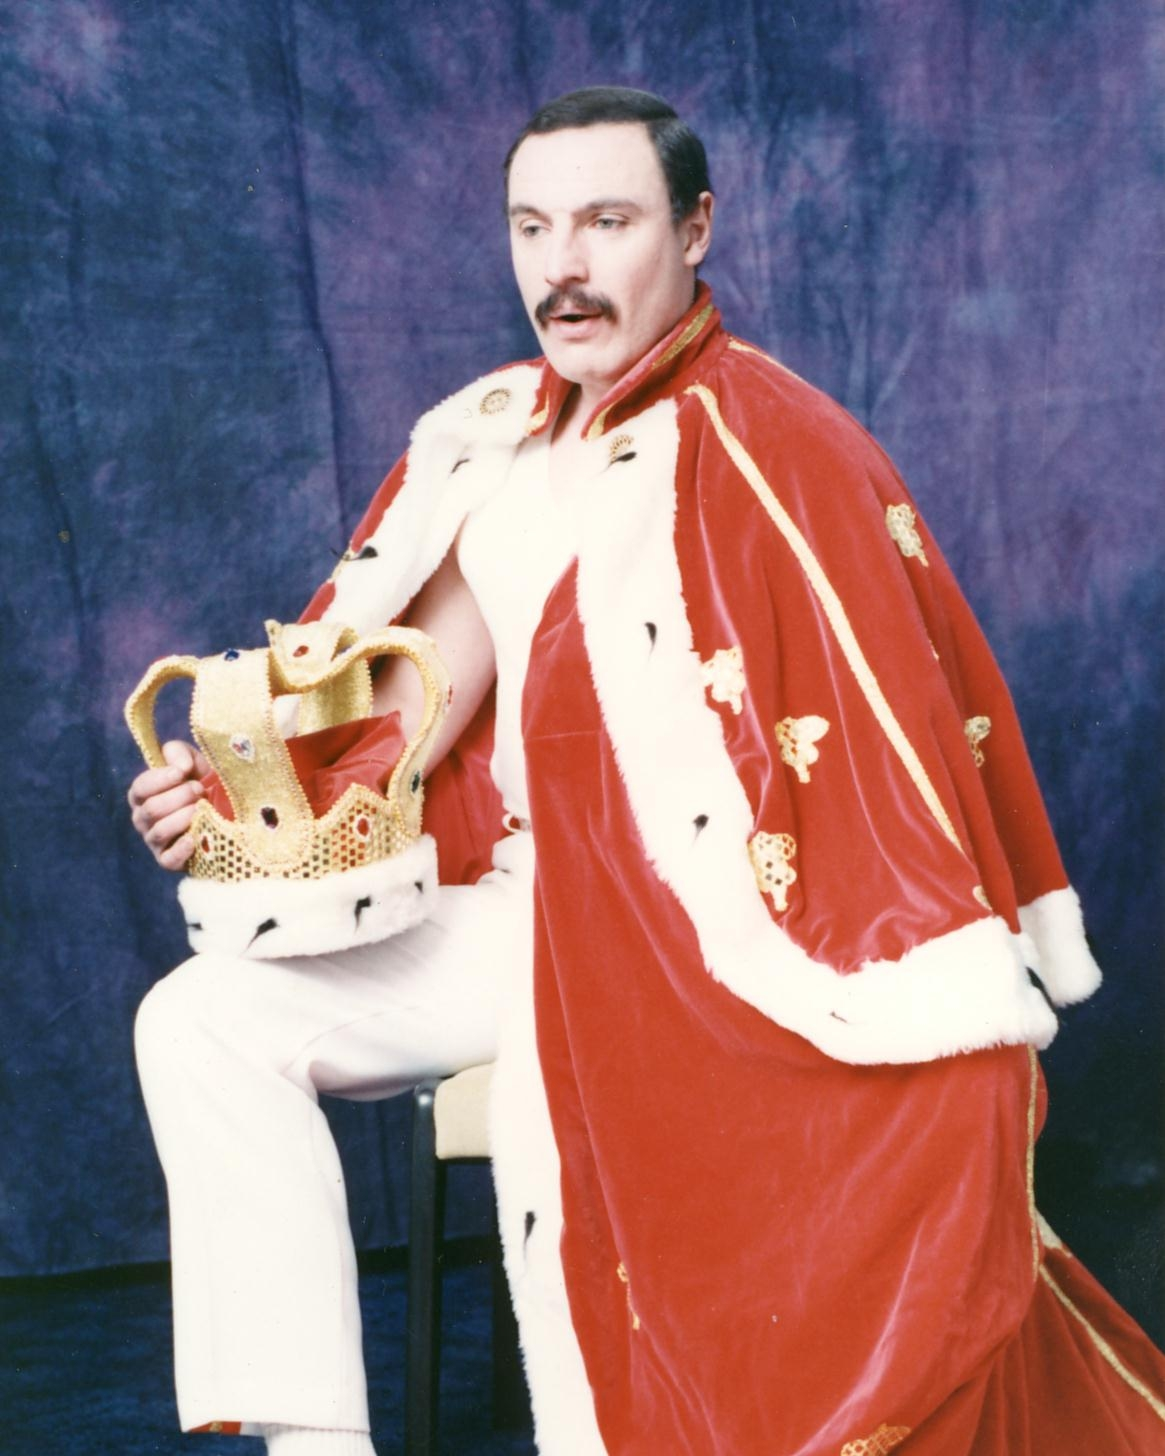 Freddie Mercury uk xsp co uk.jpg